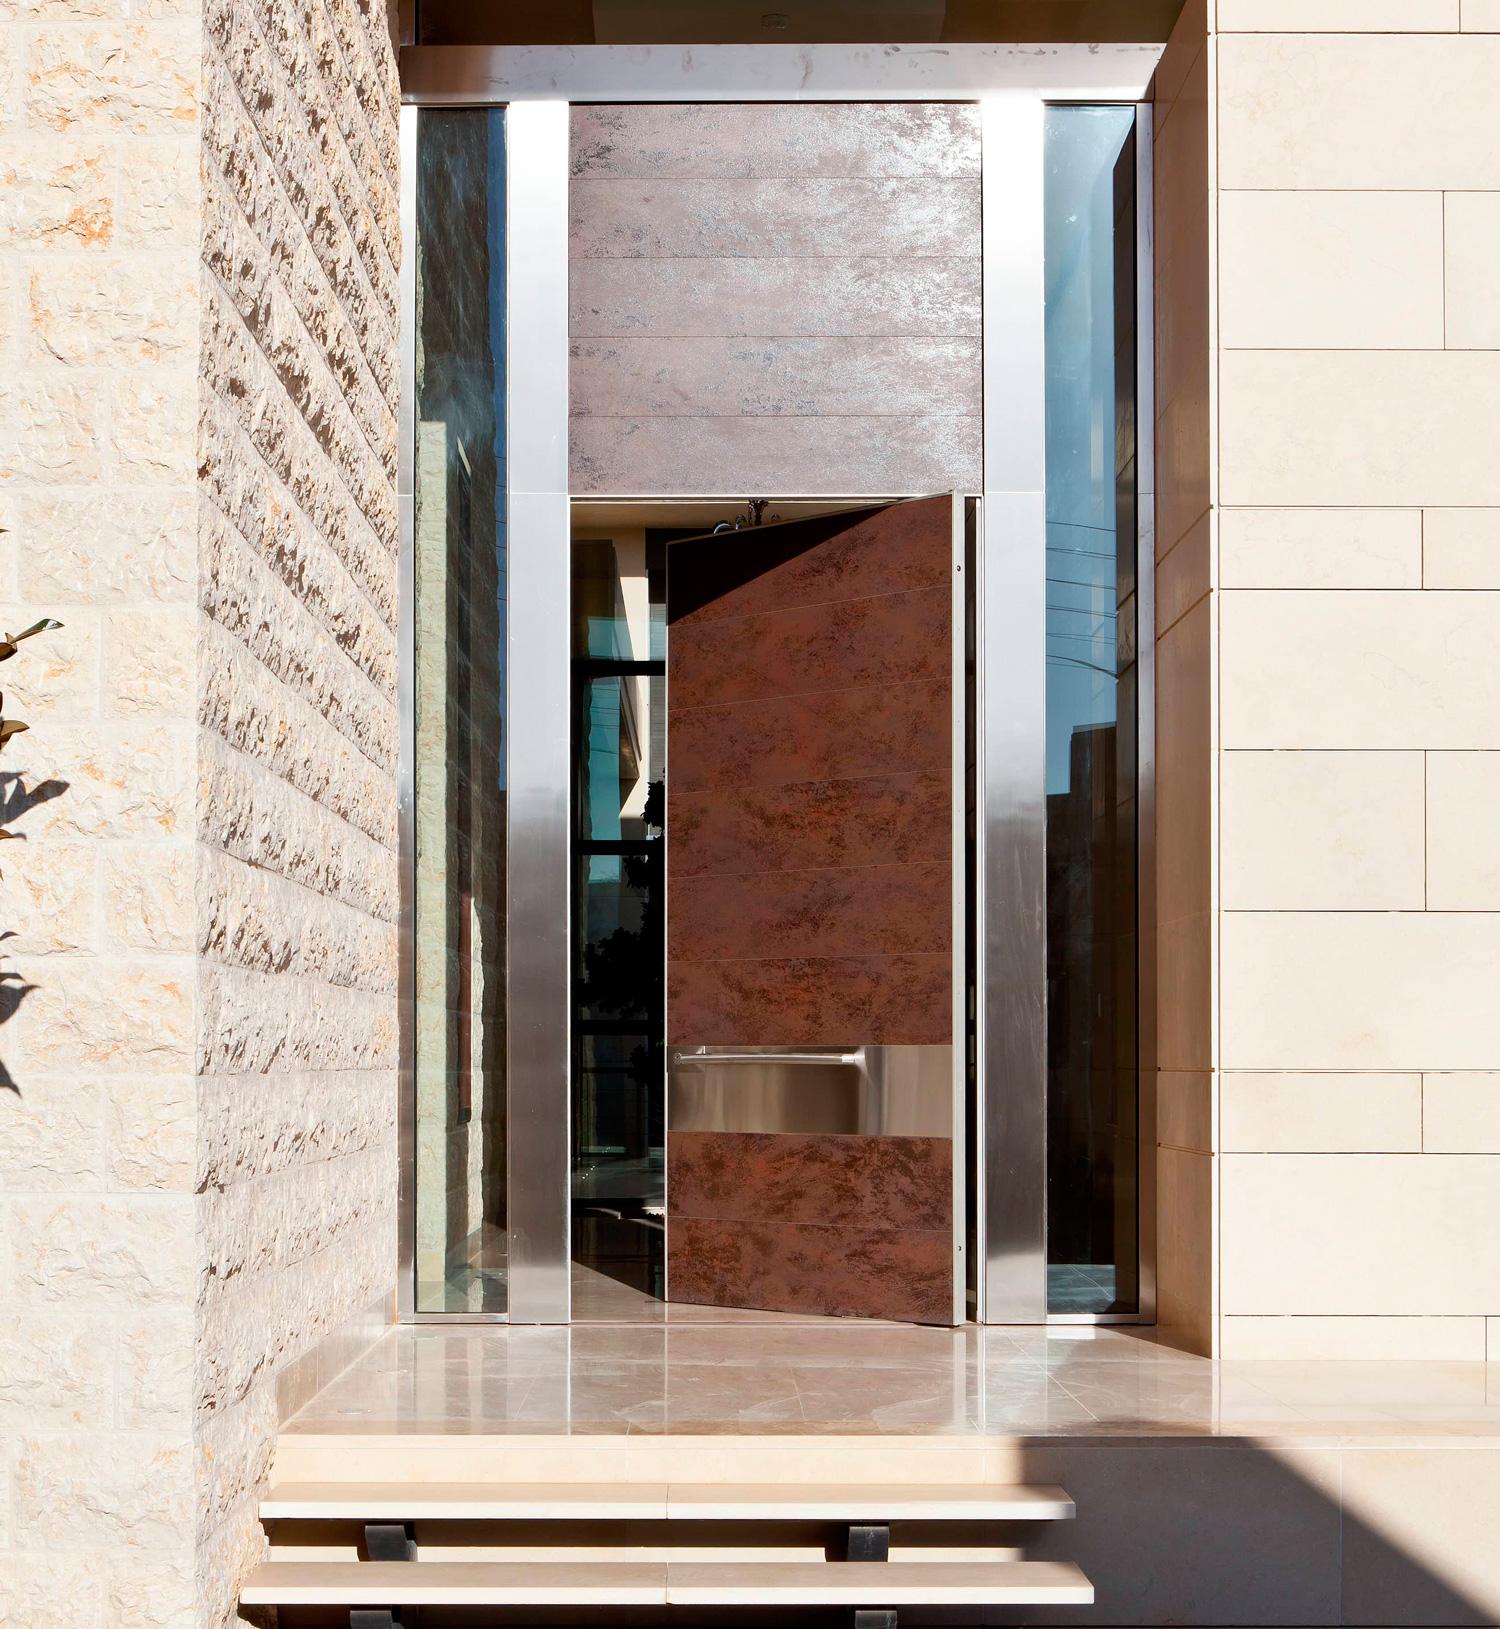 puerta blindada Synua Wall System de Oikos continuidad parte superior